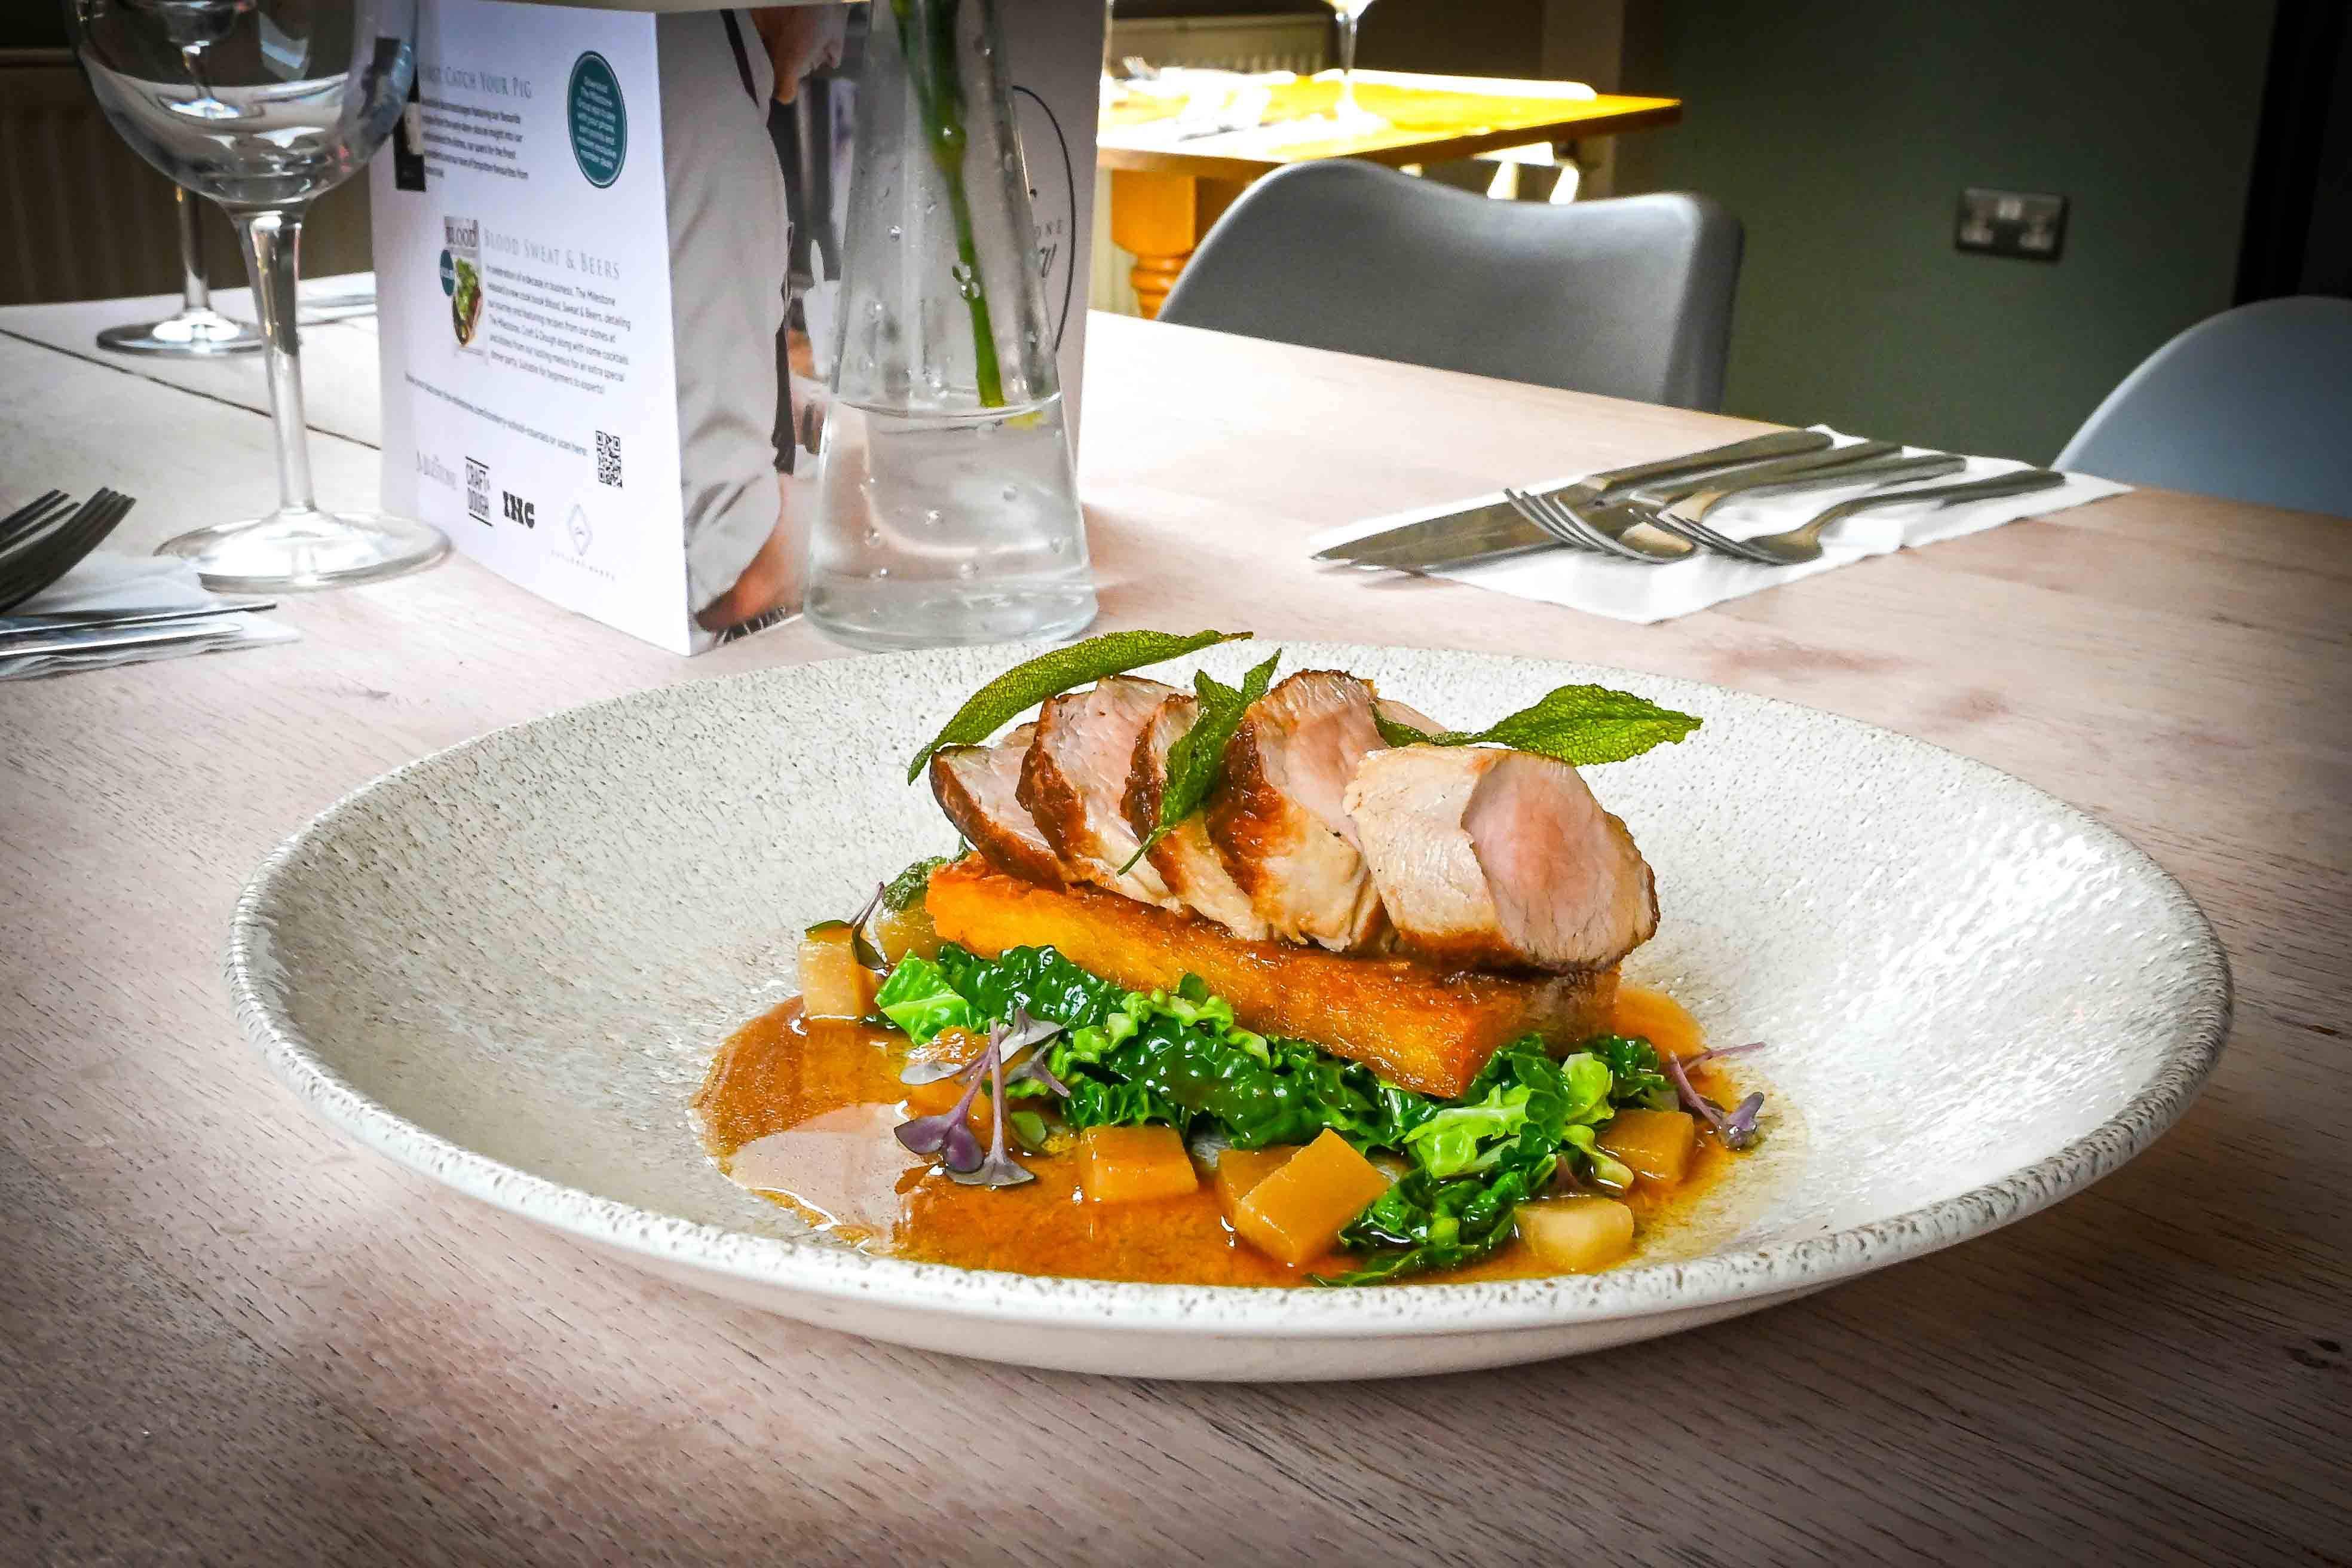 Pork tenderloin main dish at The Milestone, Sheffield